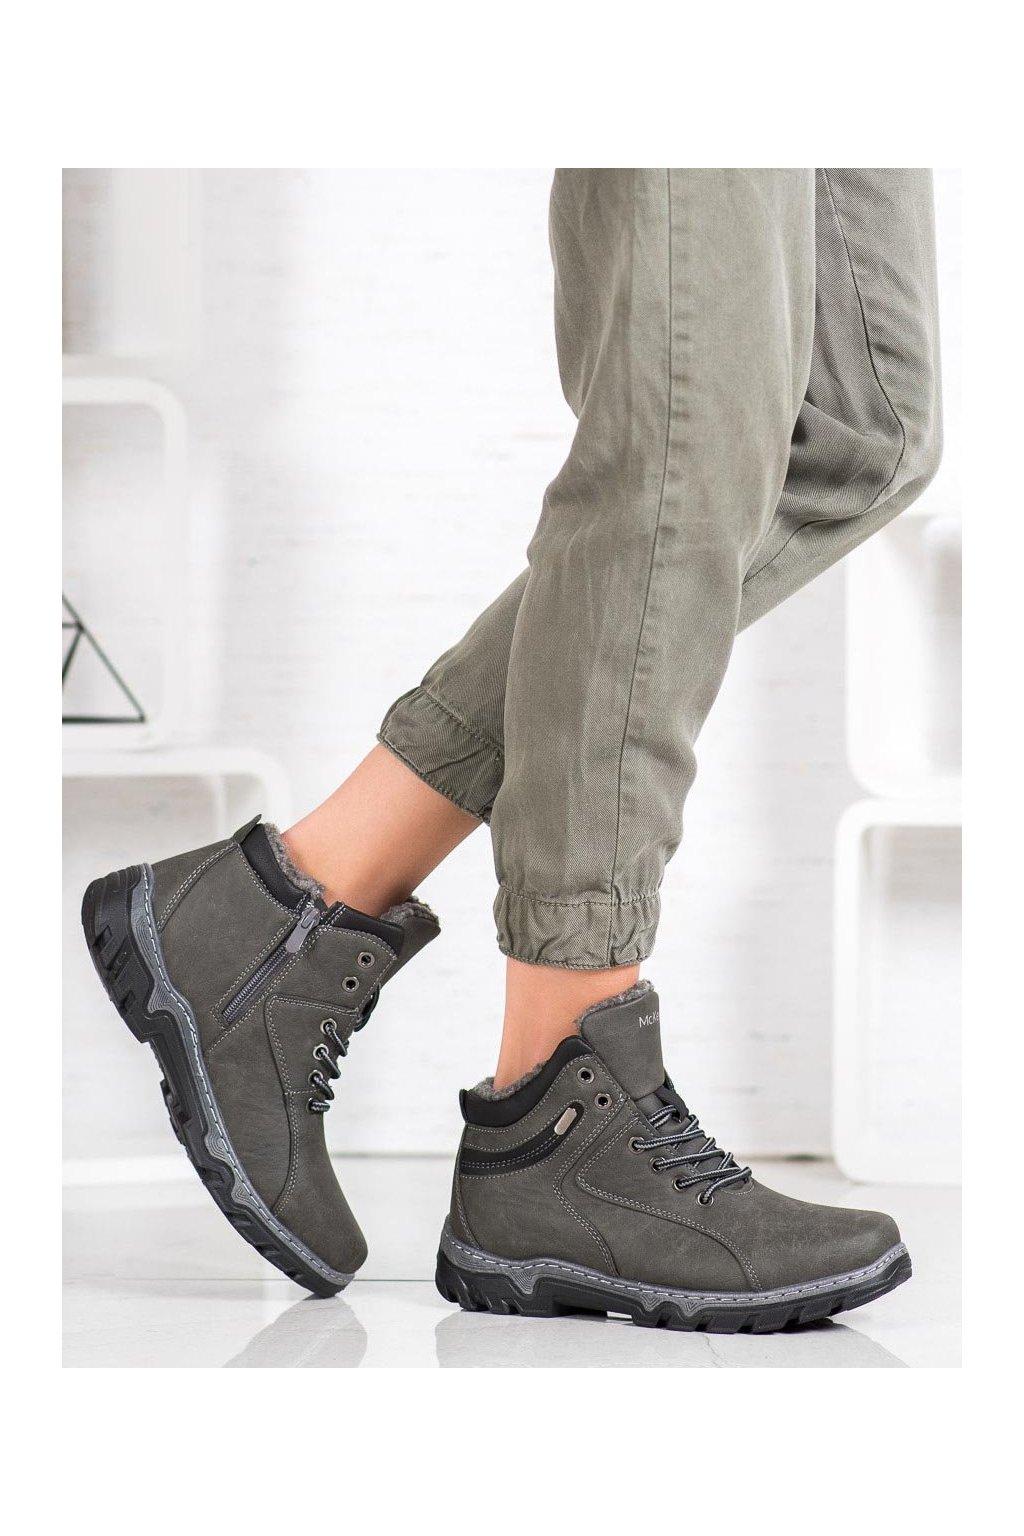 Sivé dámske trekové topánky Mckeylor kod OCA20-2156G